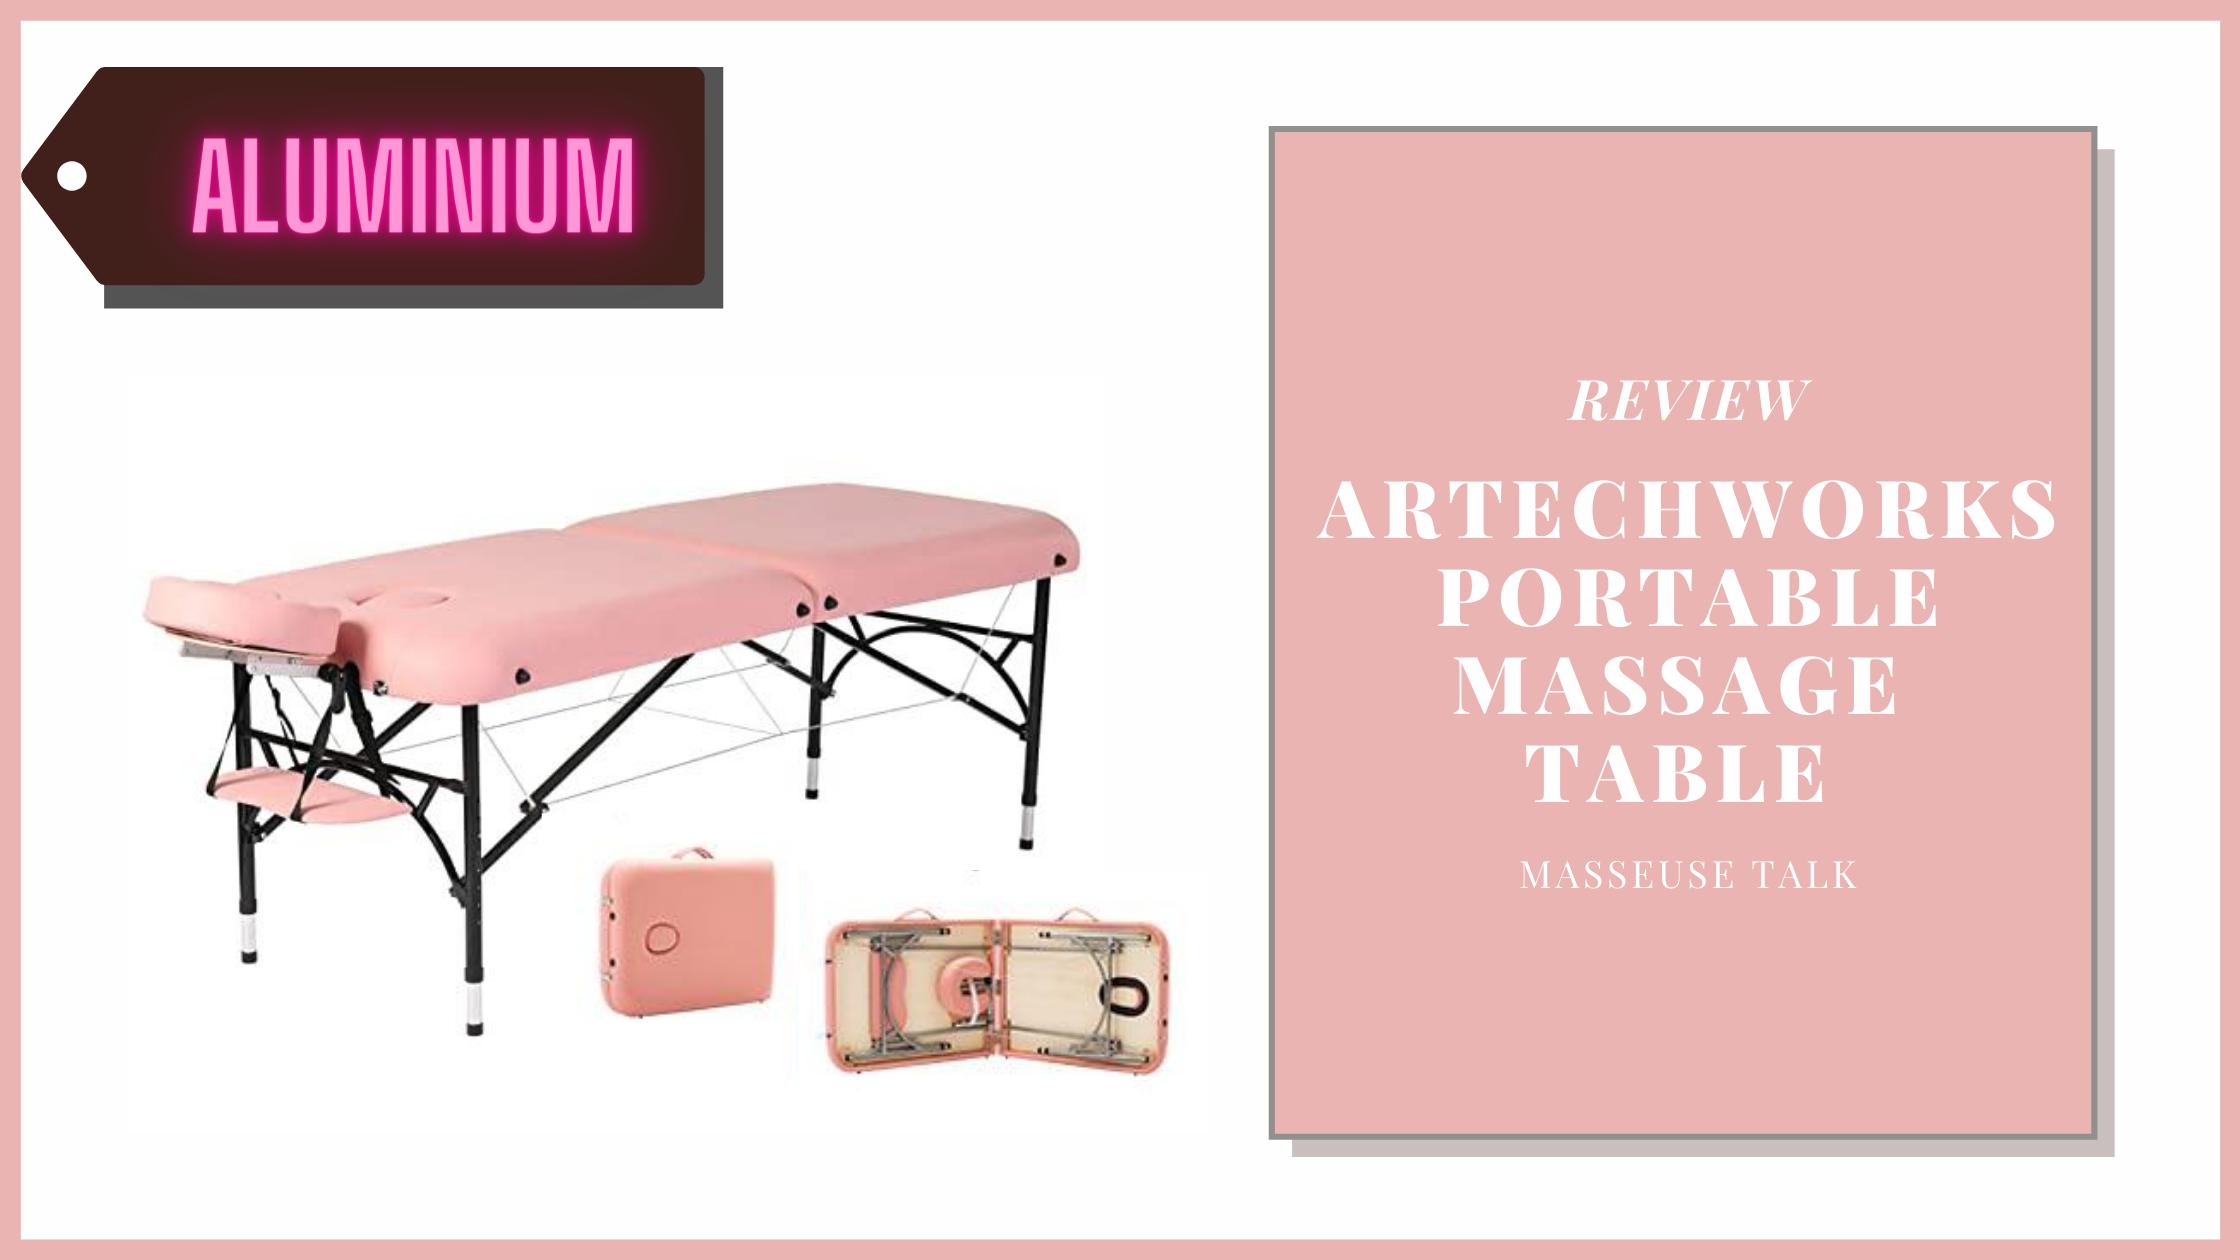 Artechworks Portable Massage Table